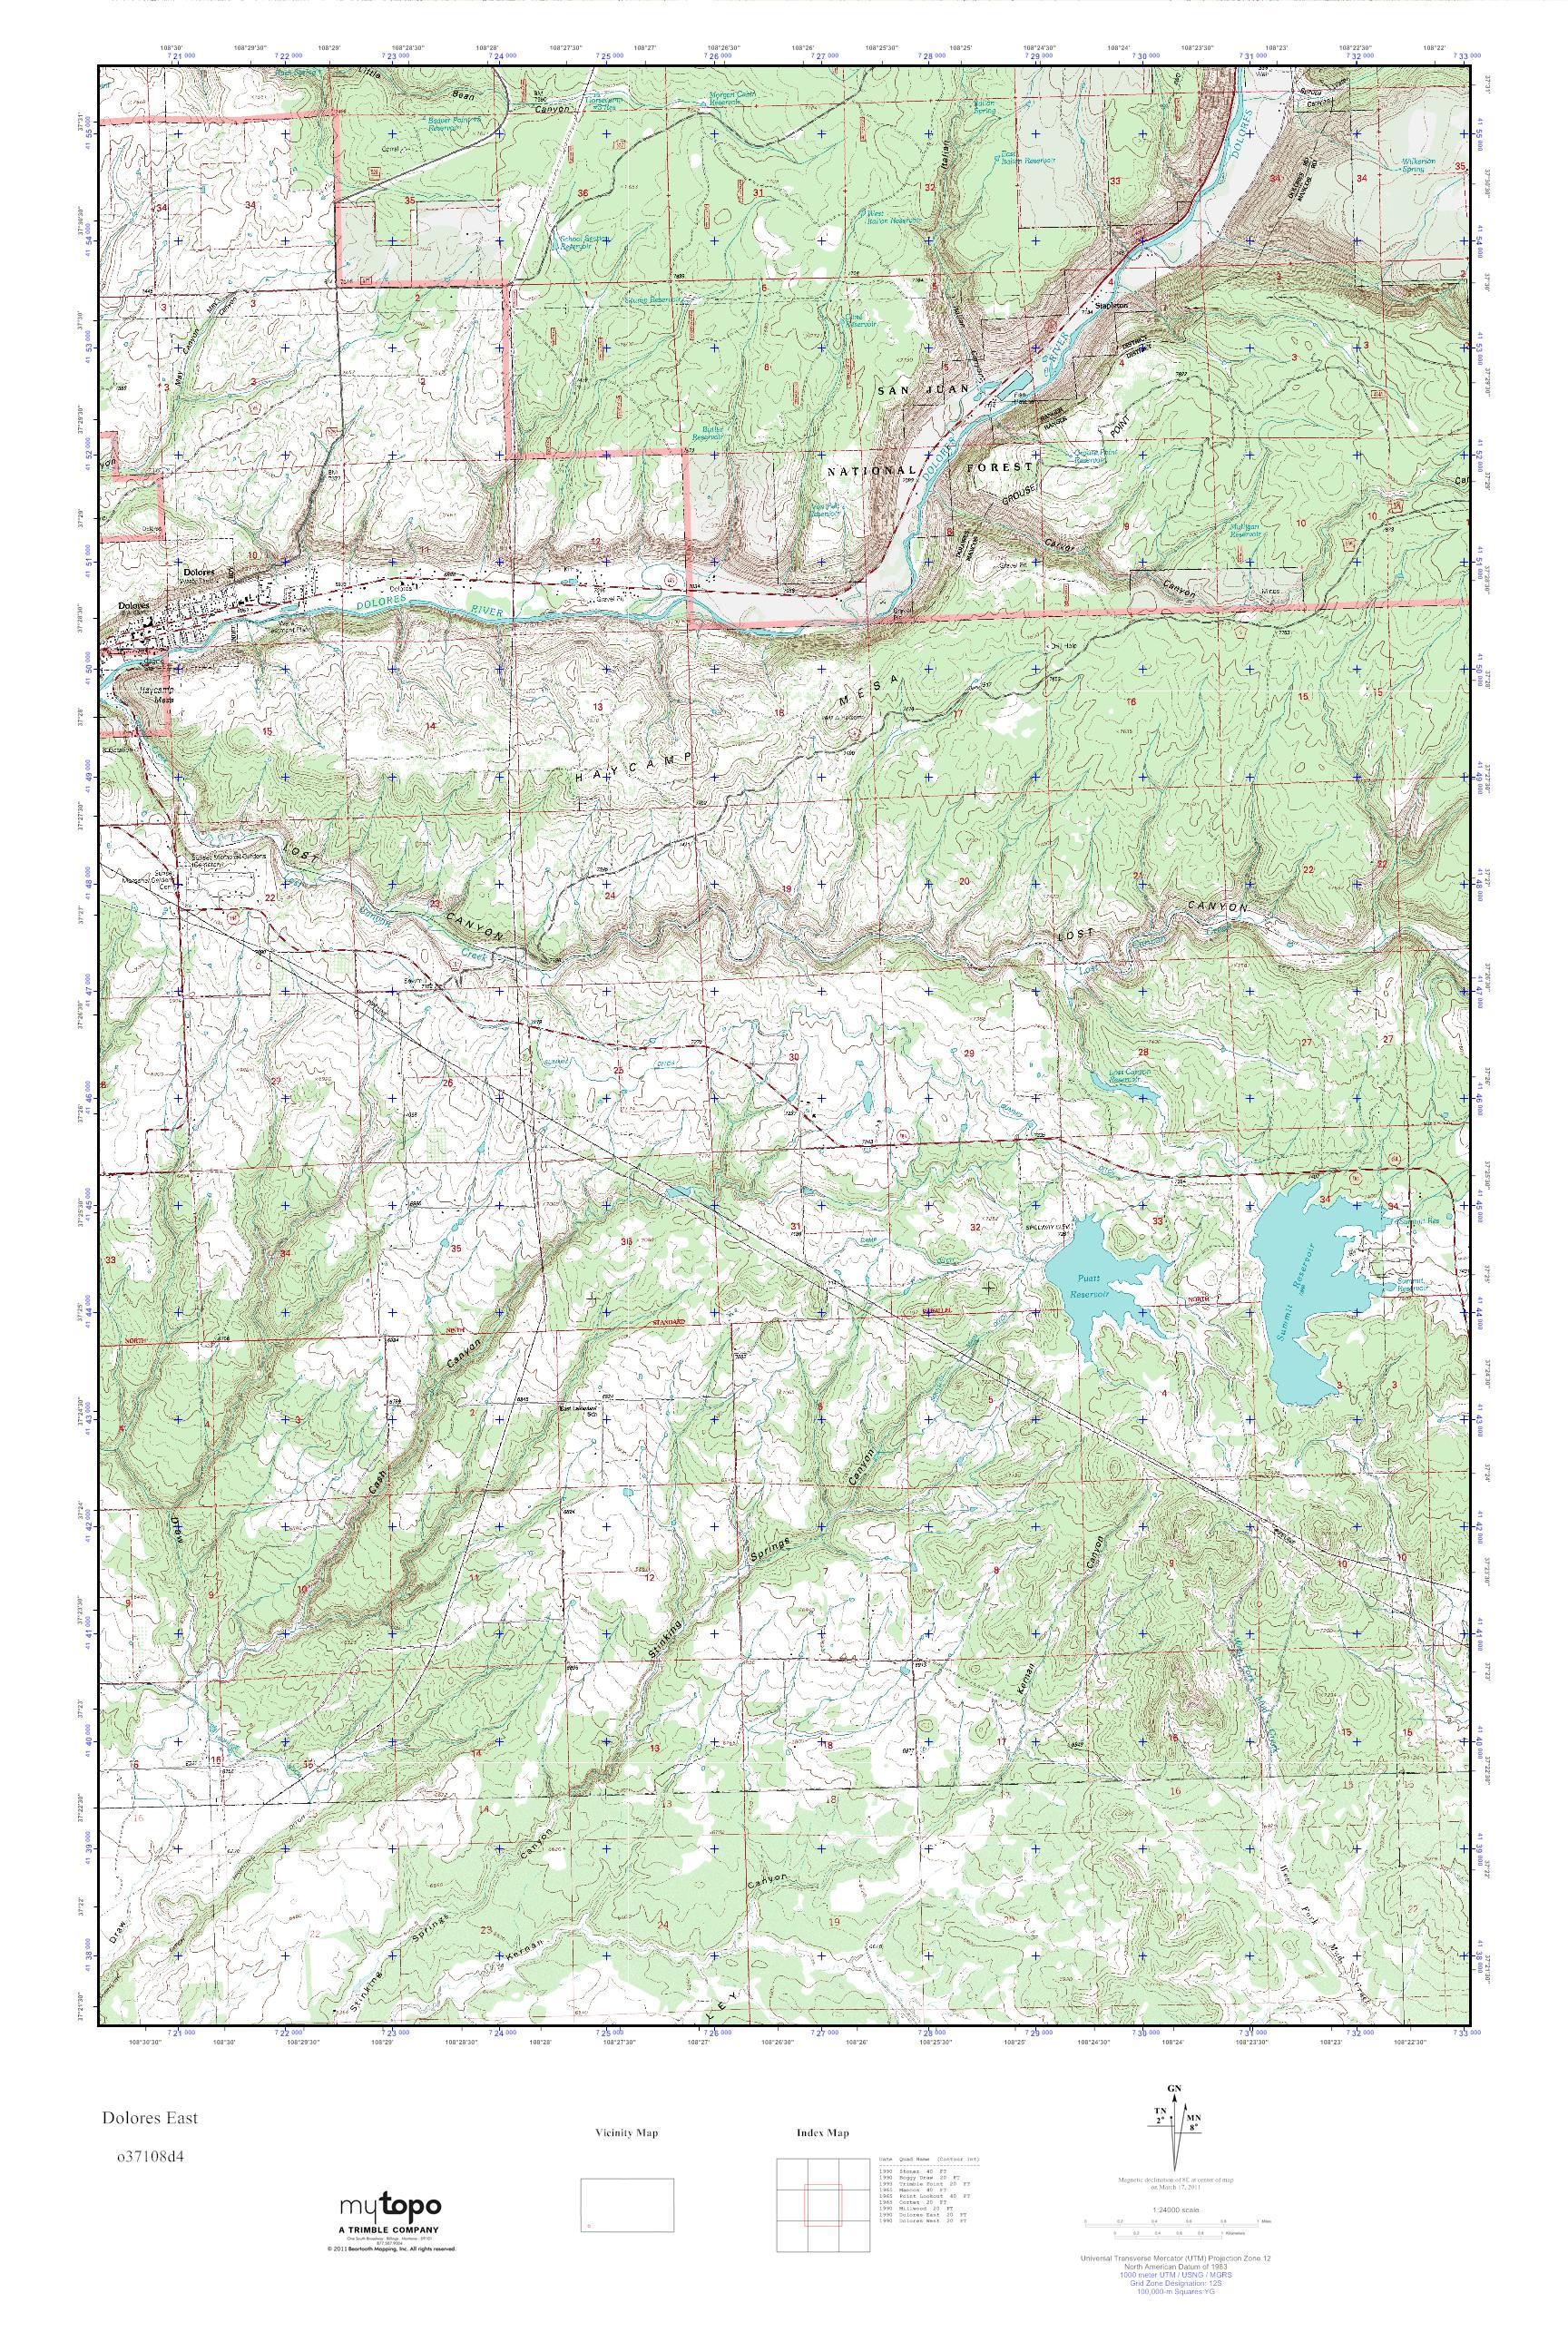 Mytopo Dolores East Colorado Usgs Quad Topo Map